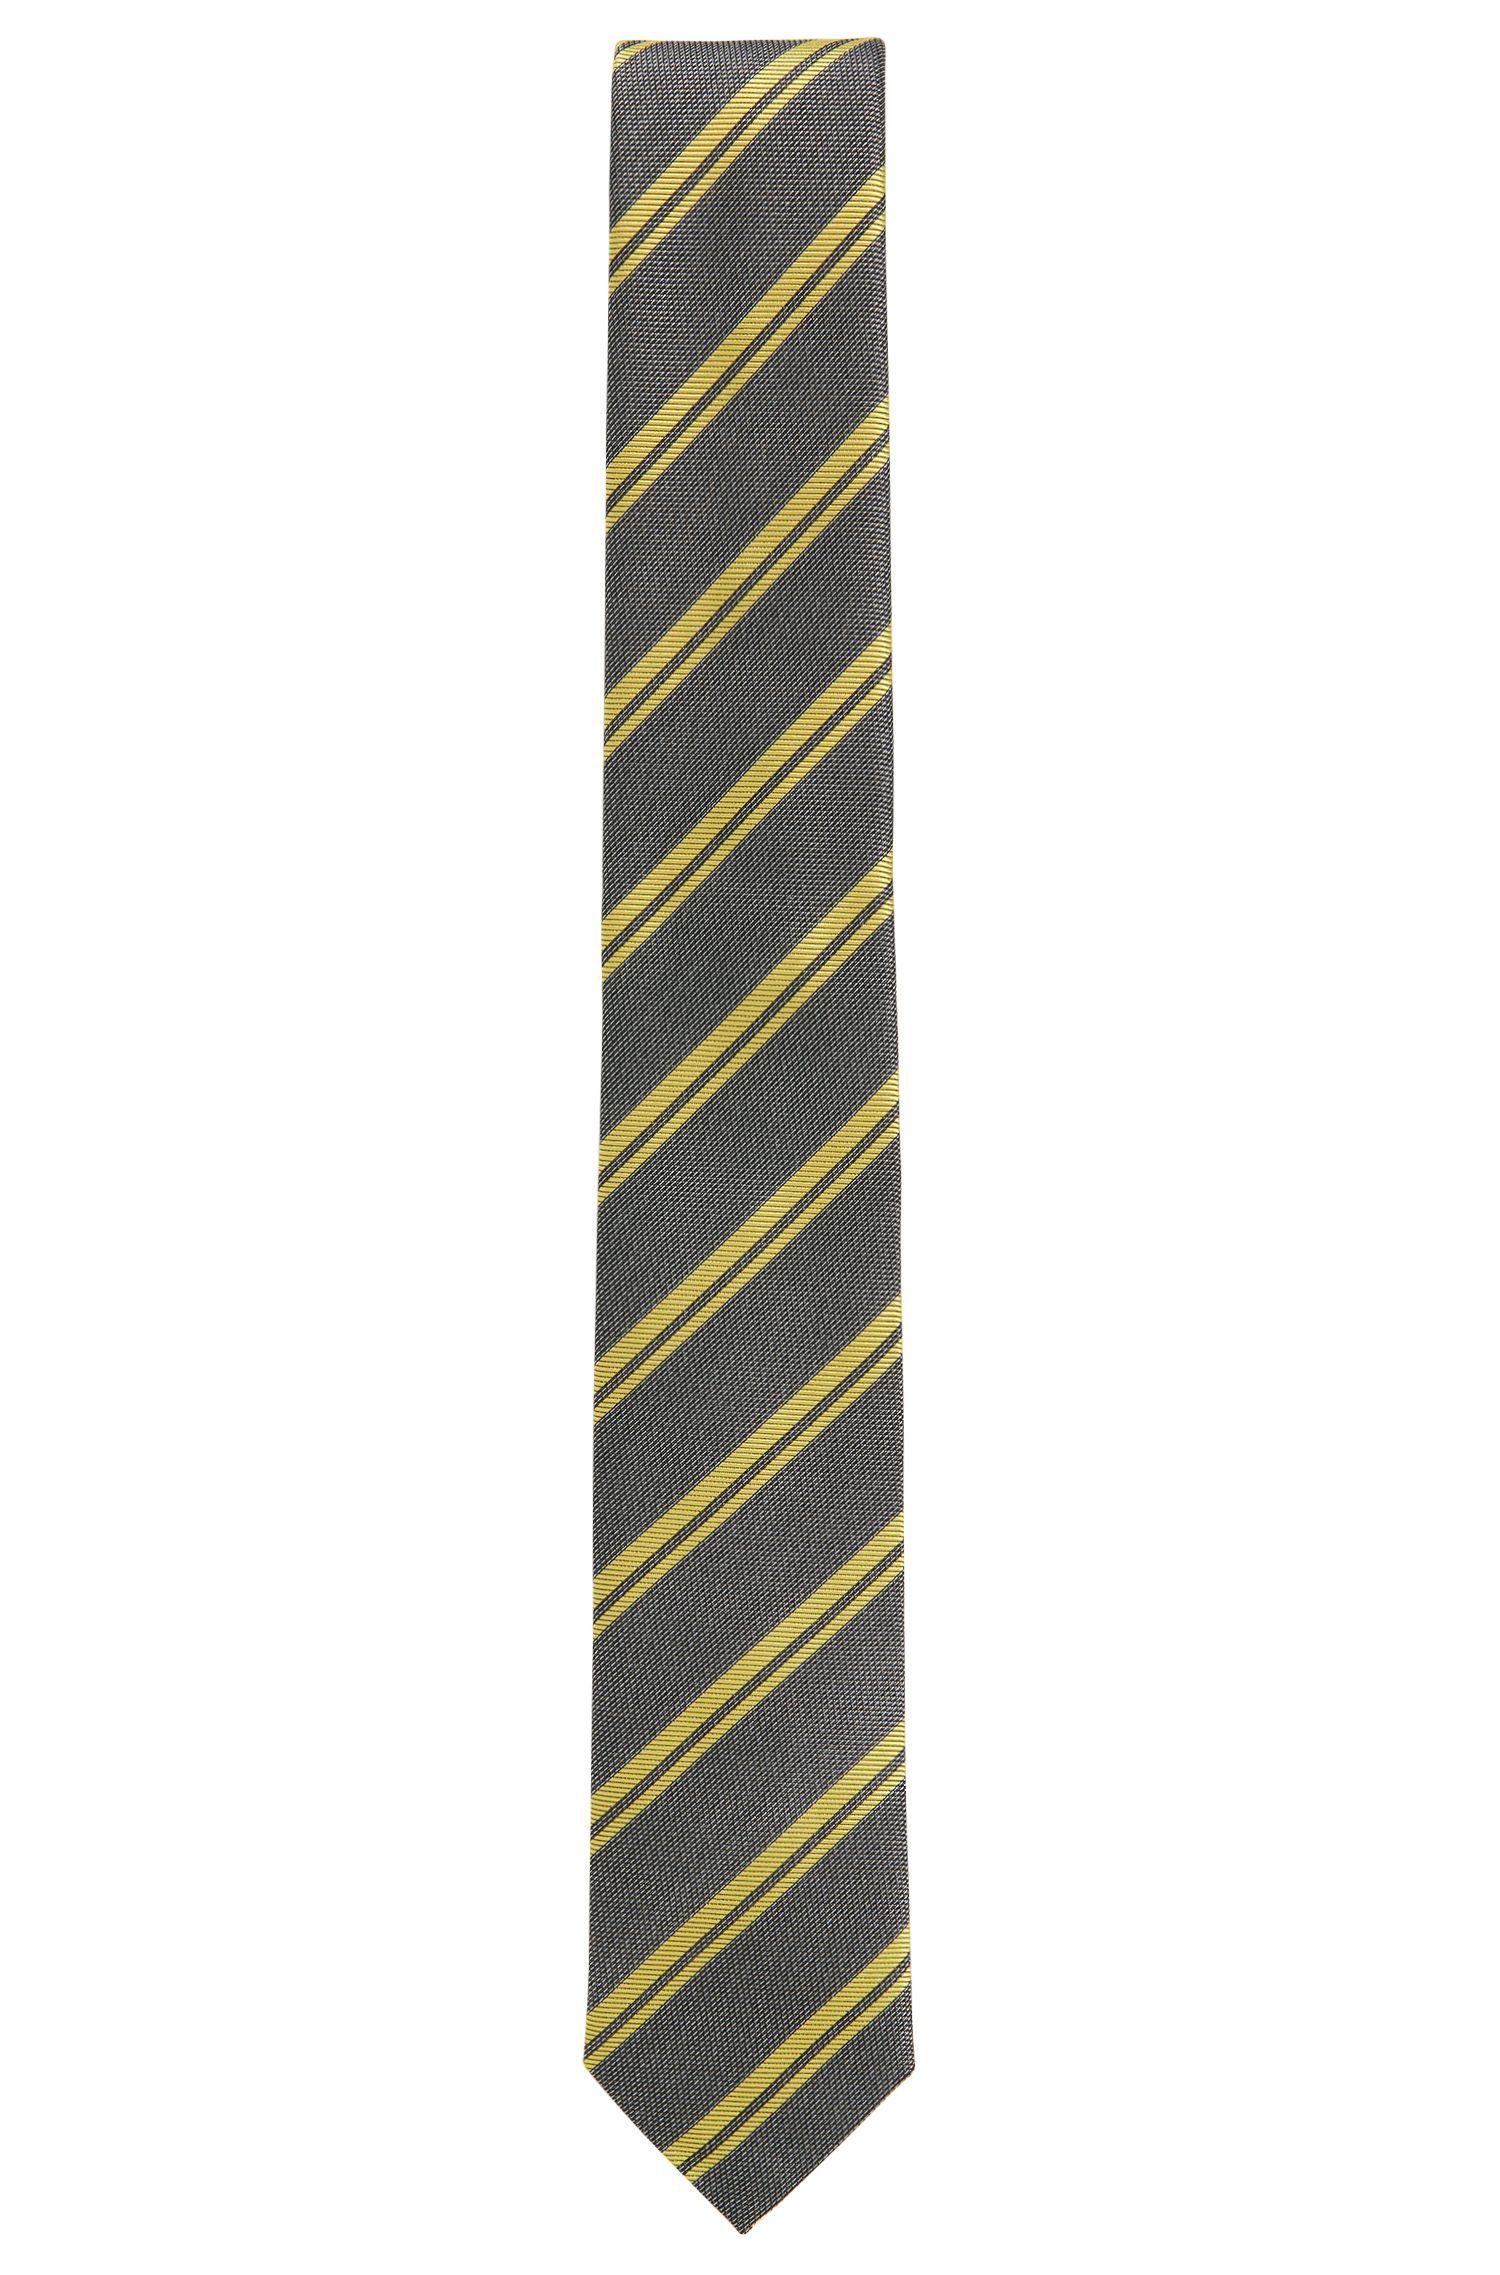 'T-Tie 6 cm' | Slim, Striped Italian Silk Tie